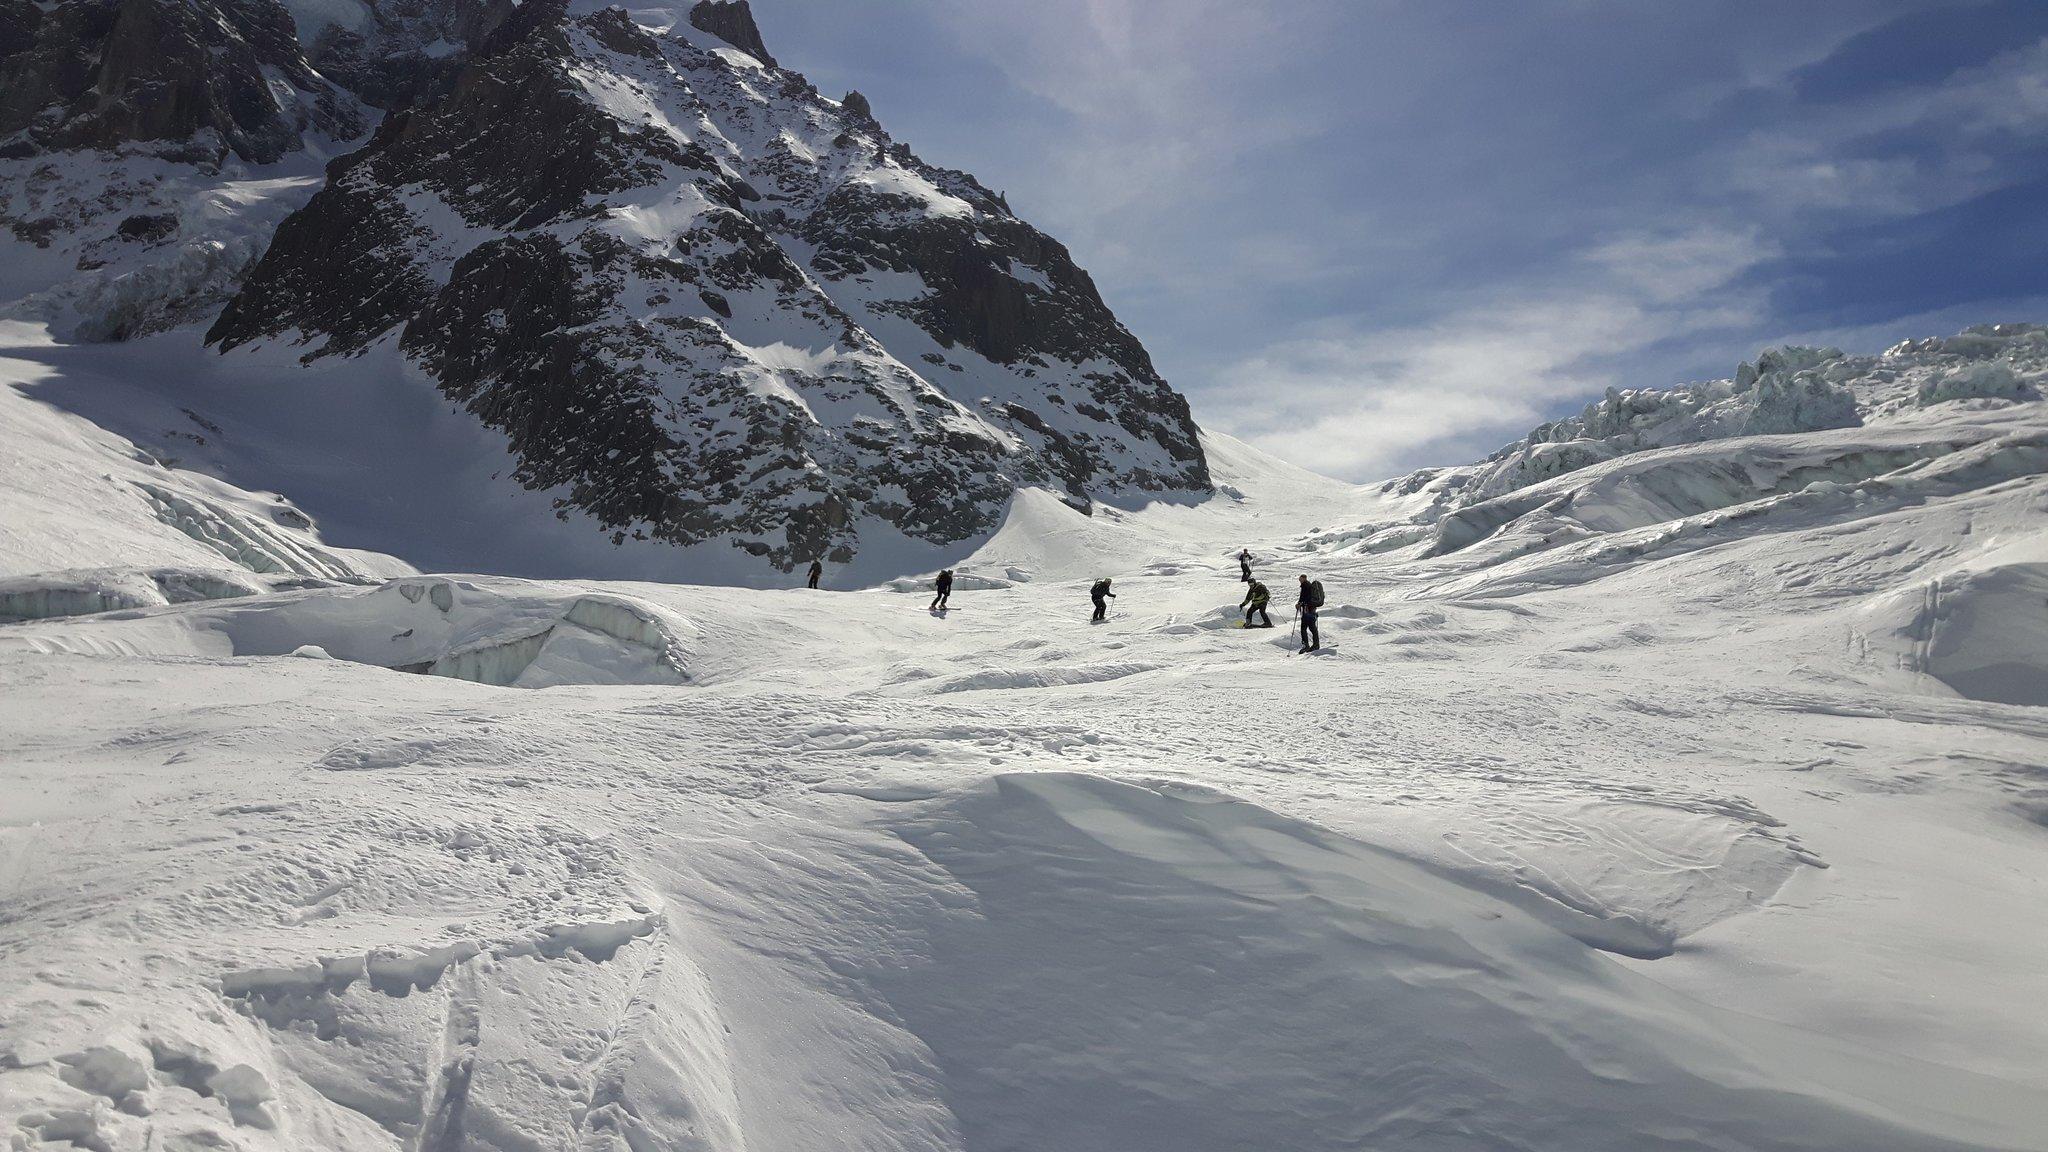 March: skiing the Vallée Blanche, Chamonix